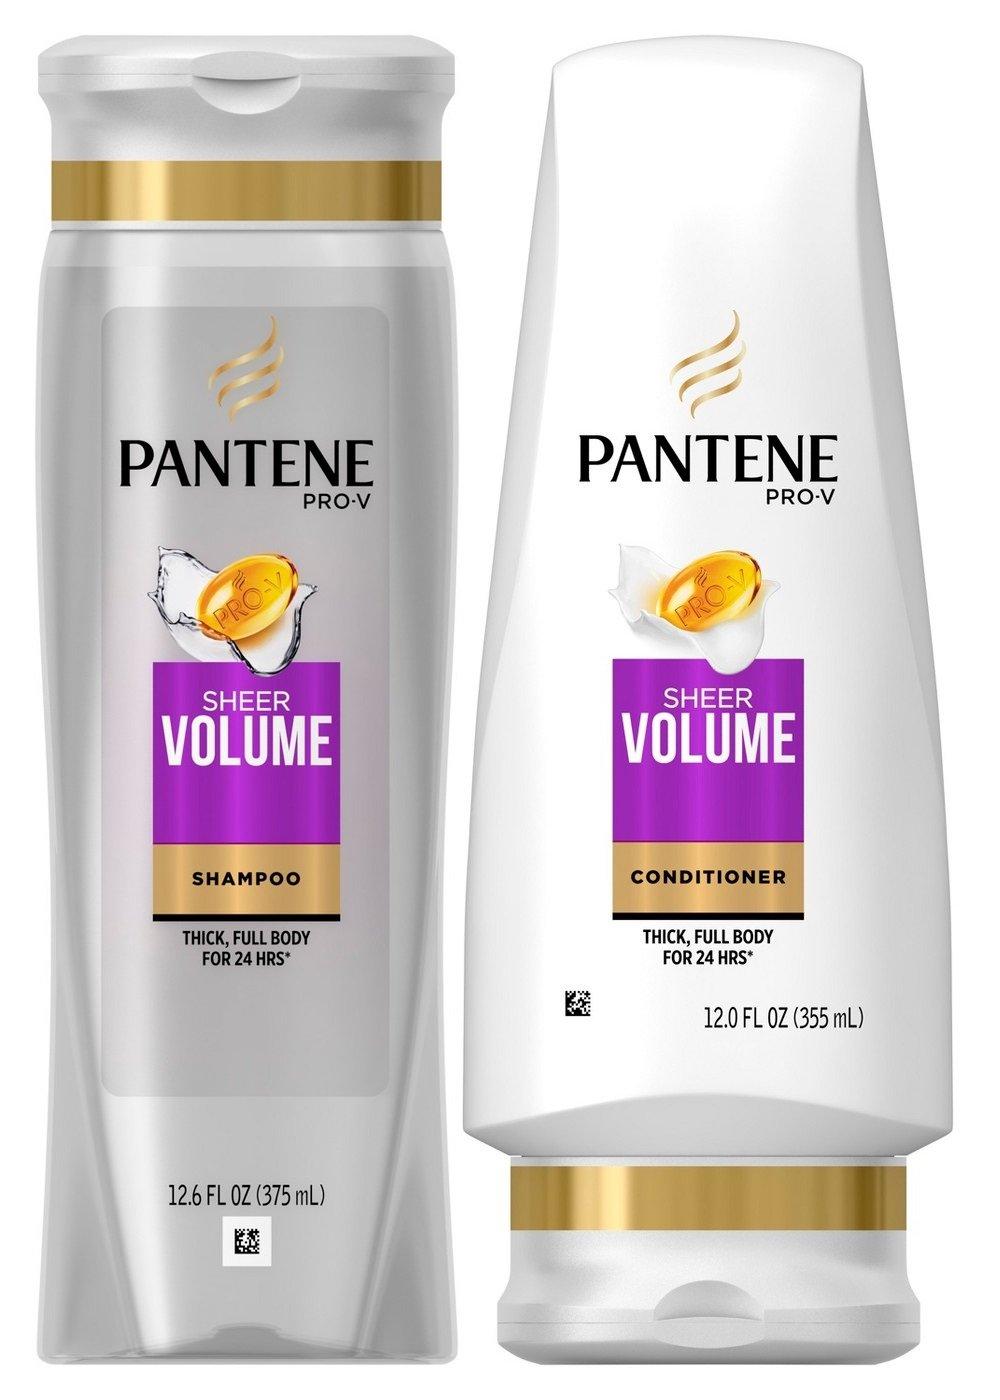 Pantene Pro-V Sheer Volume, DUO Set Shampoo + Conditioner, 12.6 Ounce, 1 each by Pantene